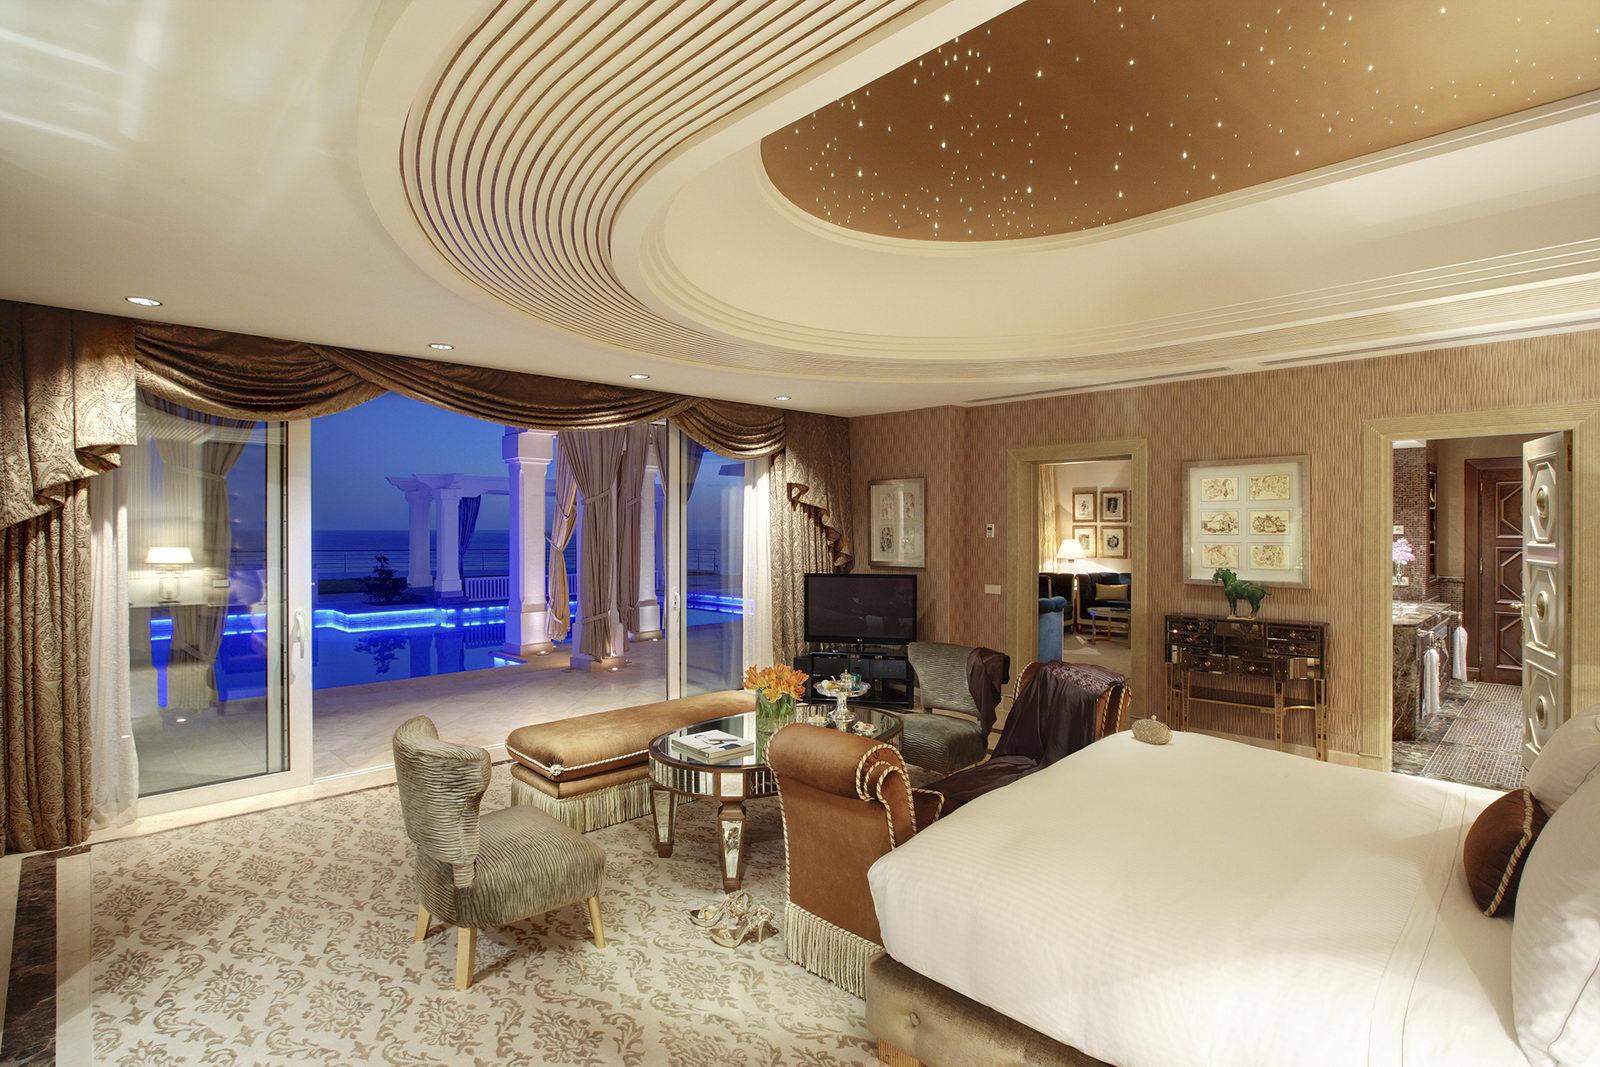 hotel le mirage tanger 2 hotel club le mirage tanger. Black Bedroom Furniture Sets. Home Design Ideas